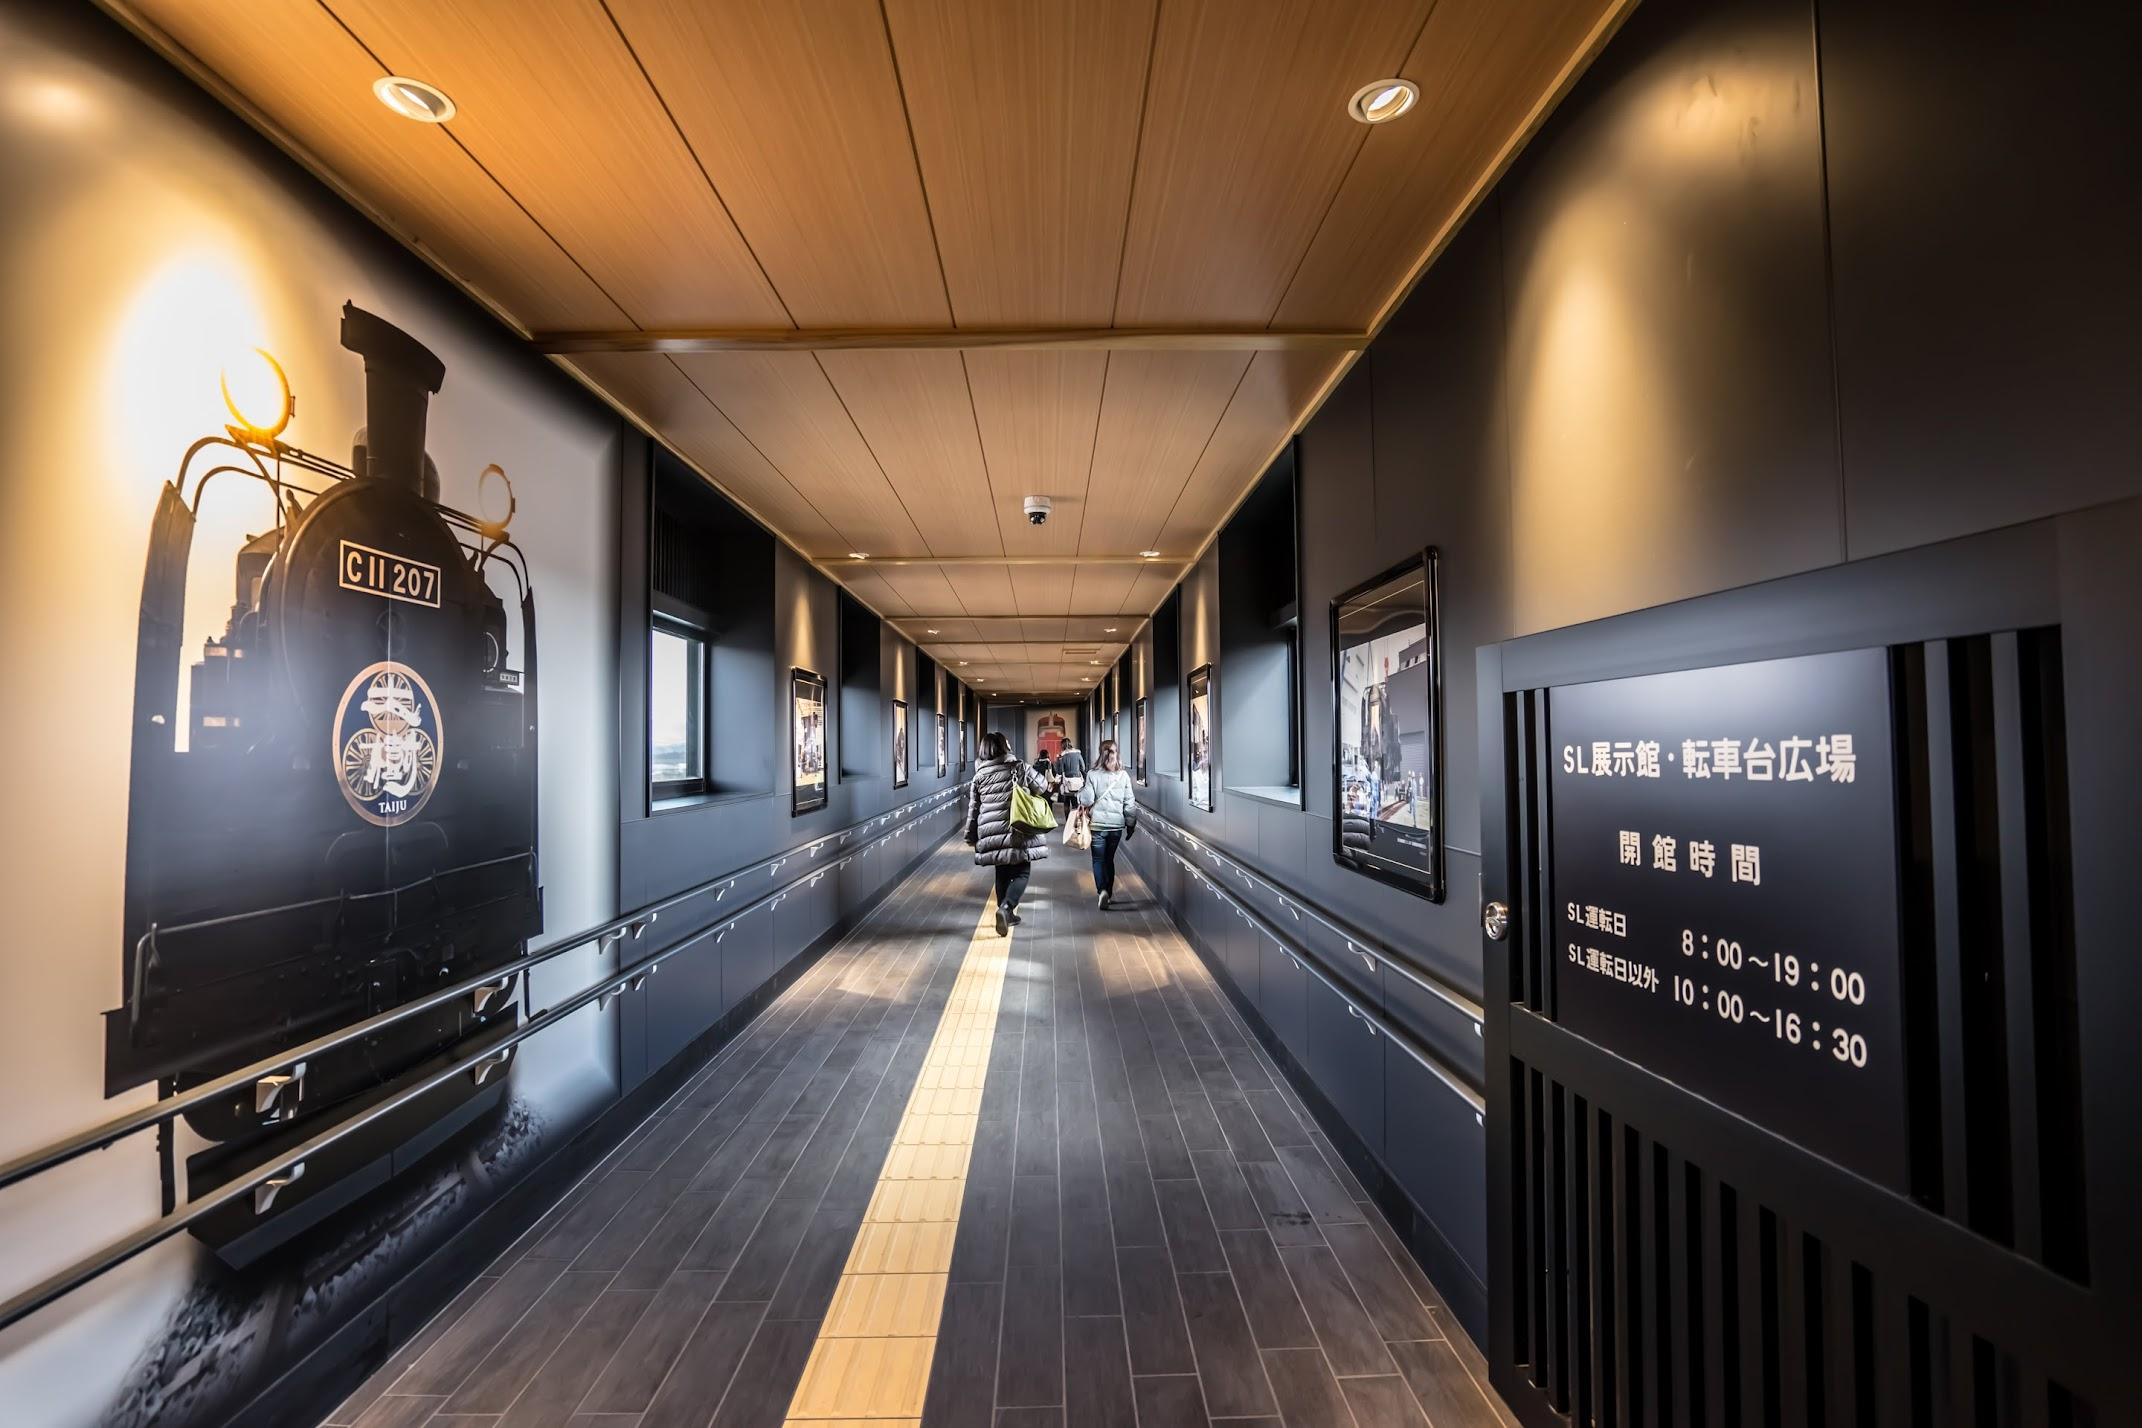 Shimo-imaichi station SL exhibition hall1